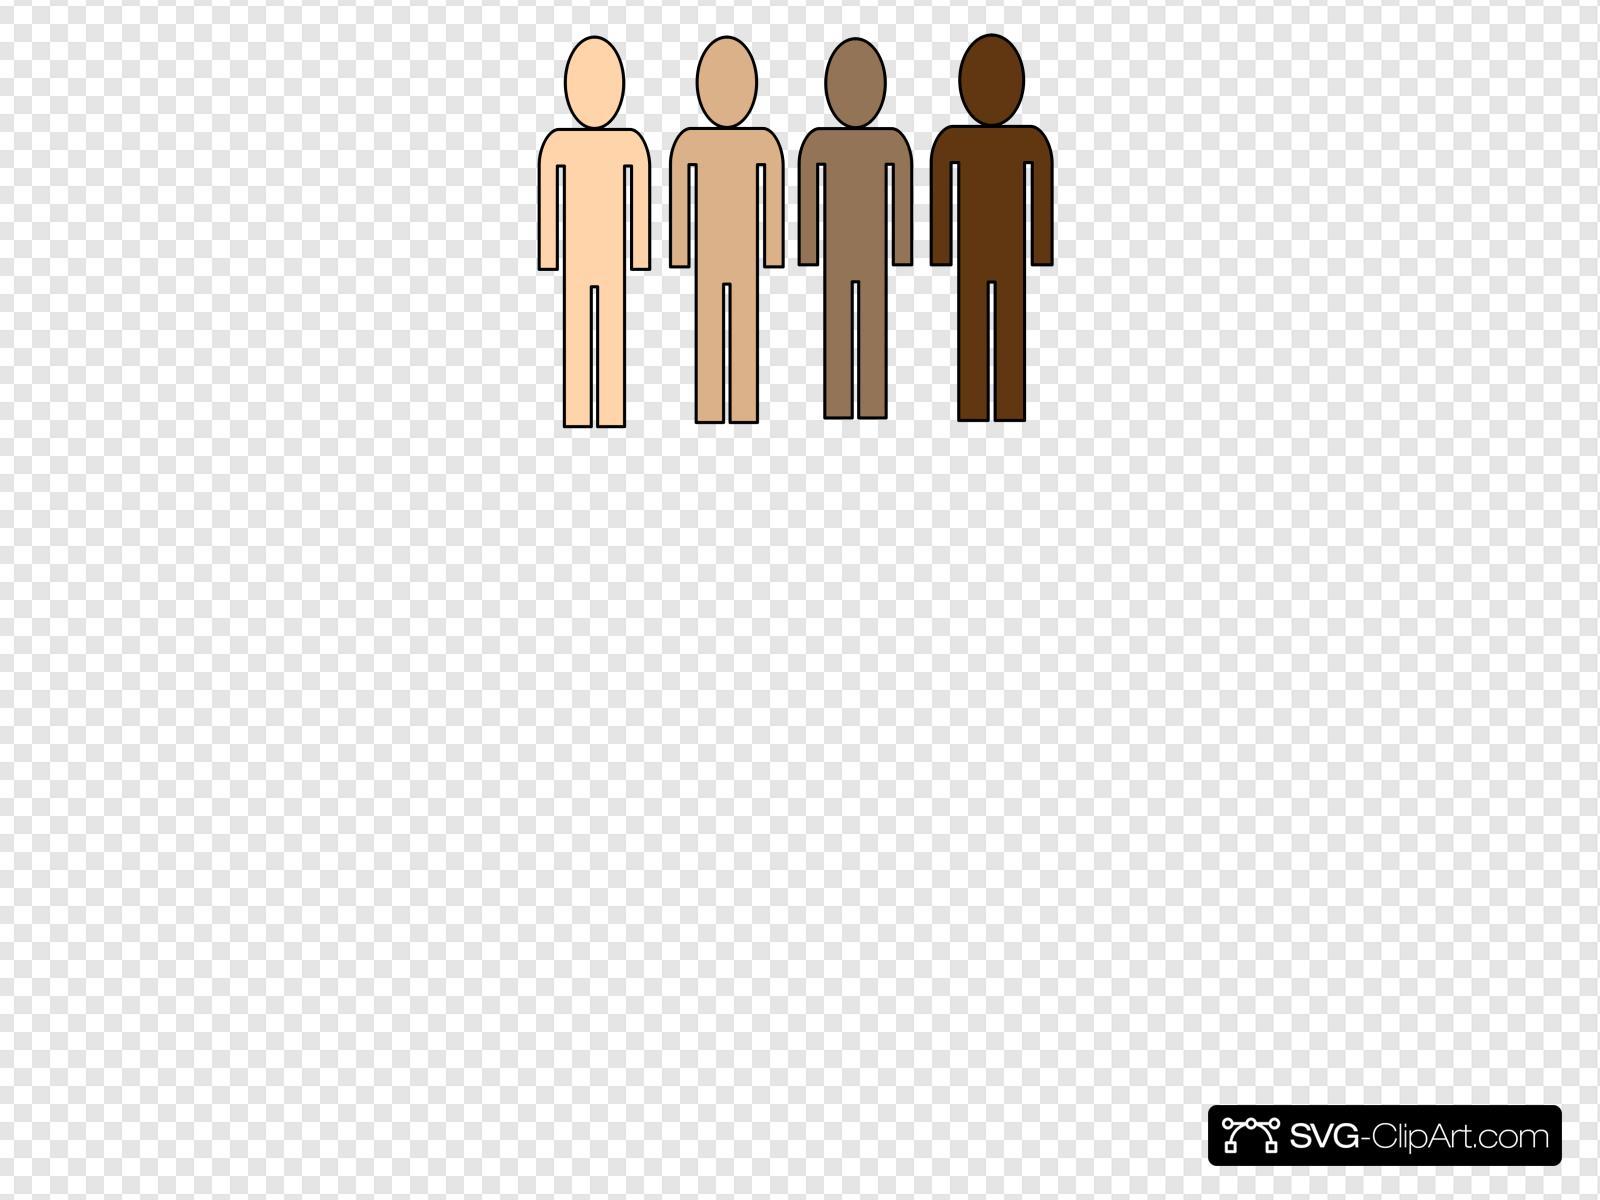 Bgt Tan Diff Clip art, Icon and SVG.